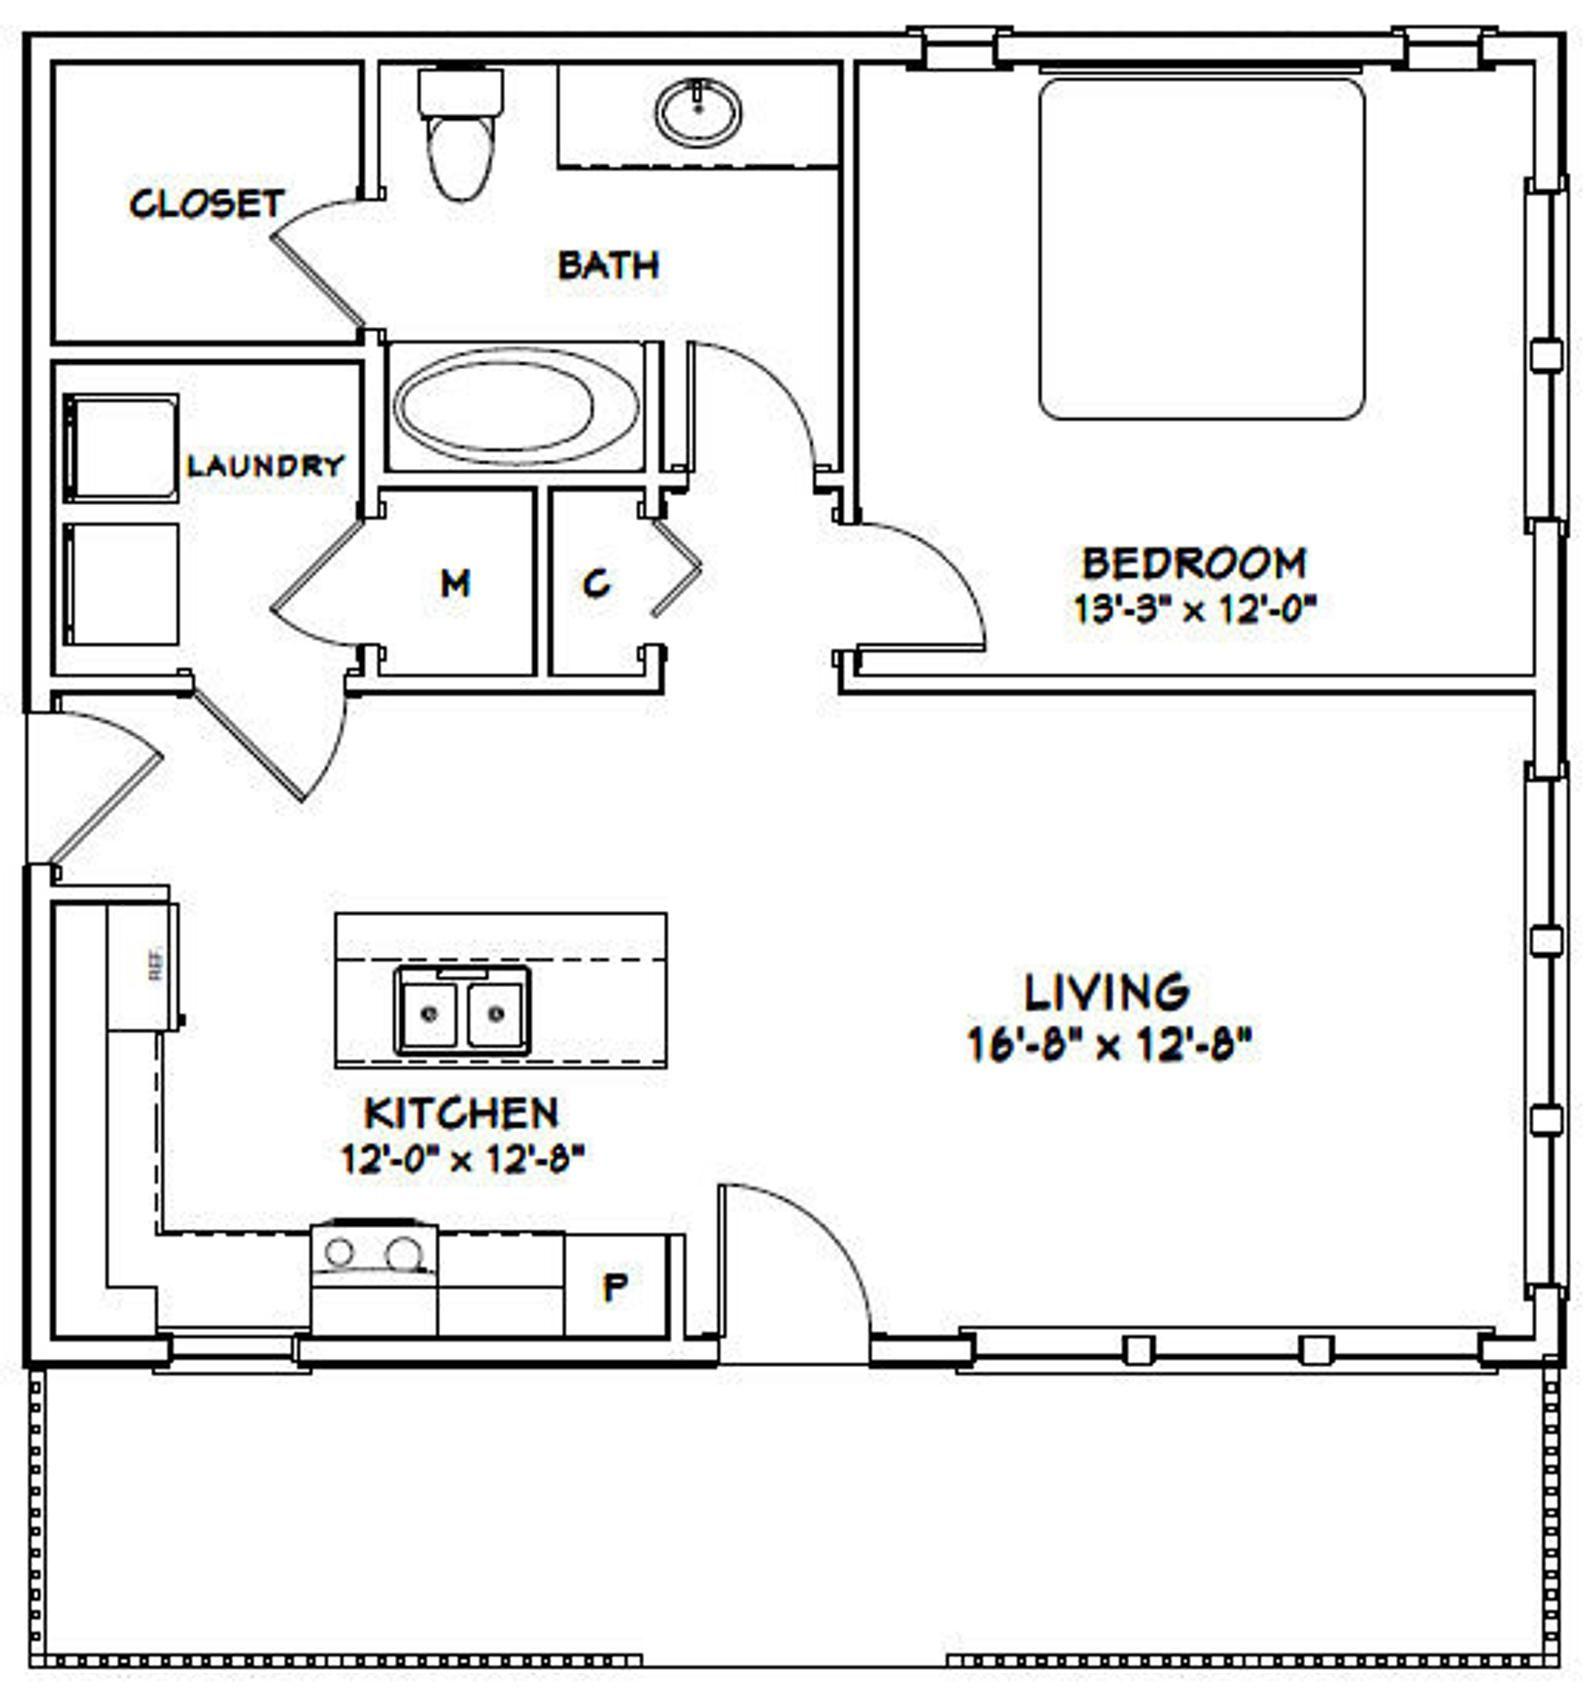 30x26 House 1-Bedroom 1-Bath 780 sq ft PDF Floor Plan